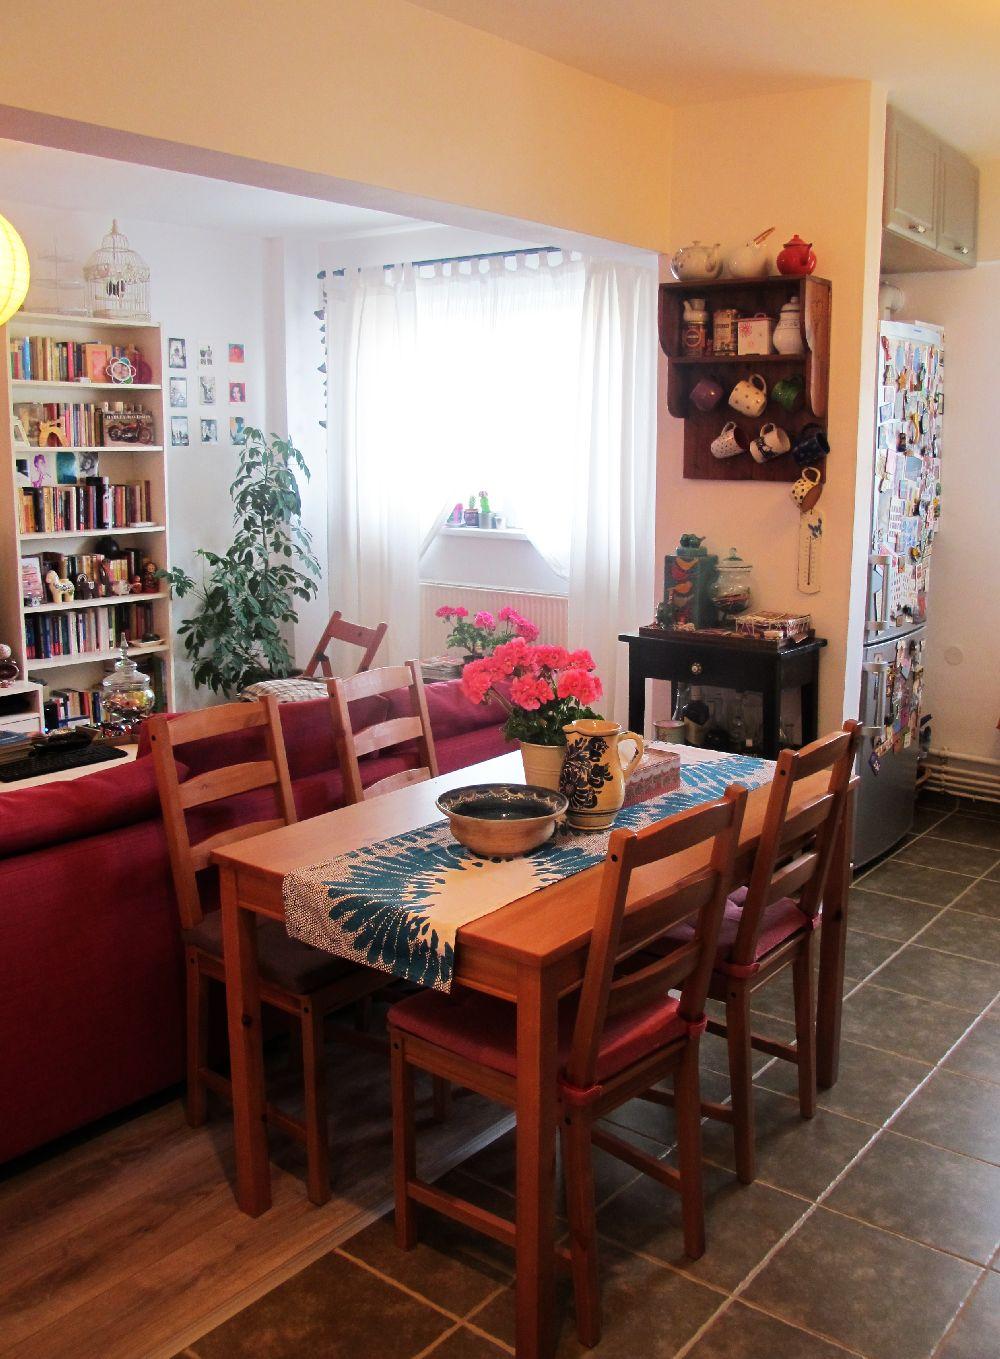 adelaparvu.com despre apartament 3 camere colorat in Sibiu, Foto Adela Parvu (63)